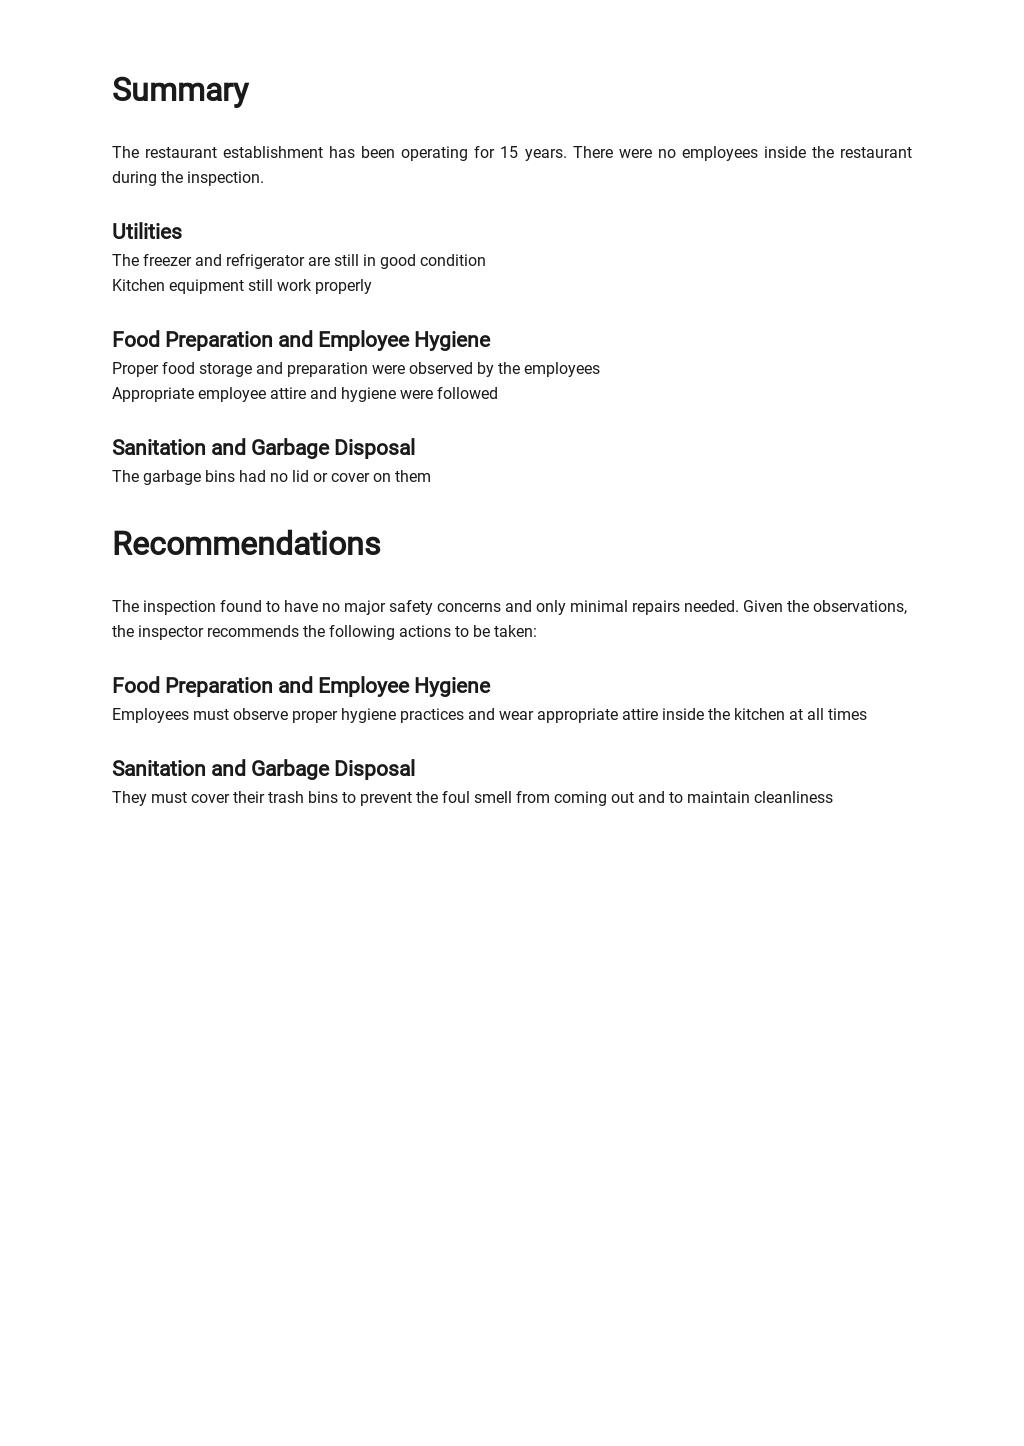 Restaurant Inspection Report Template 2.jpe